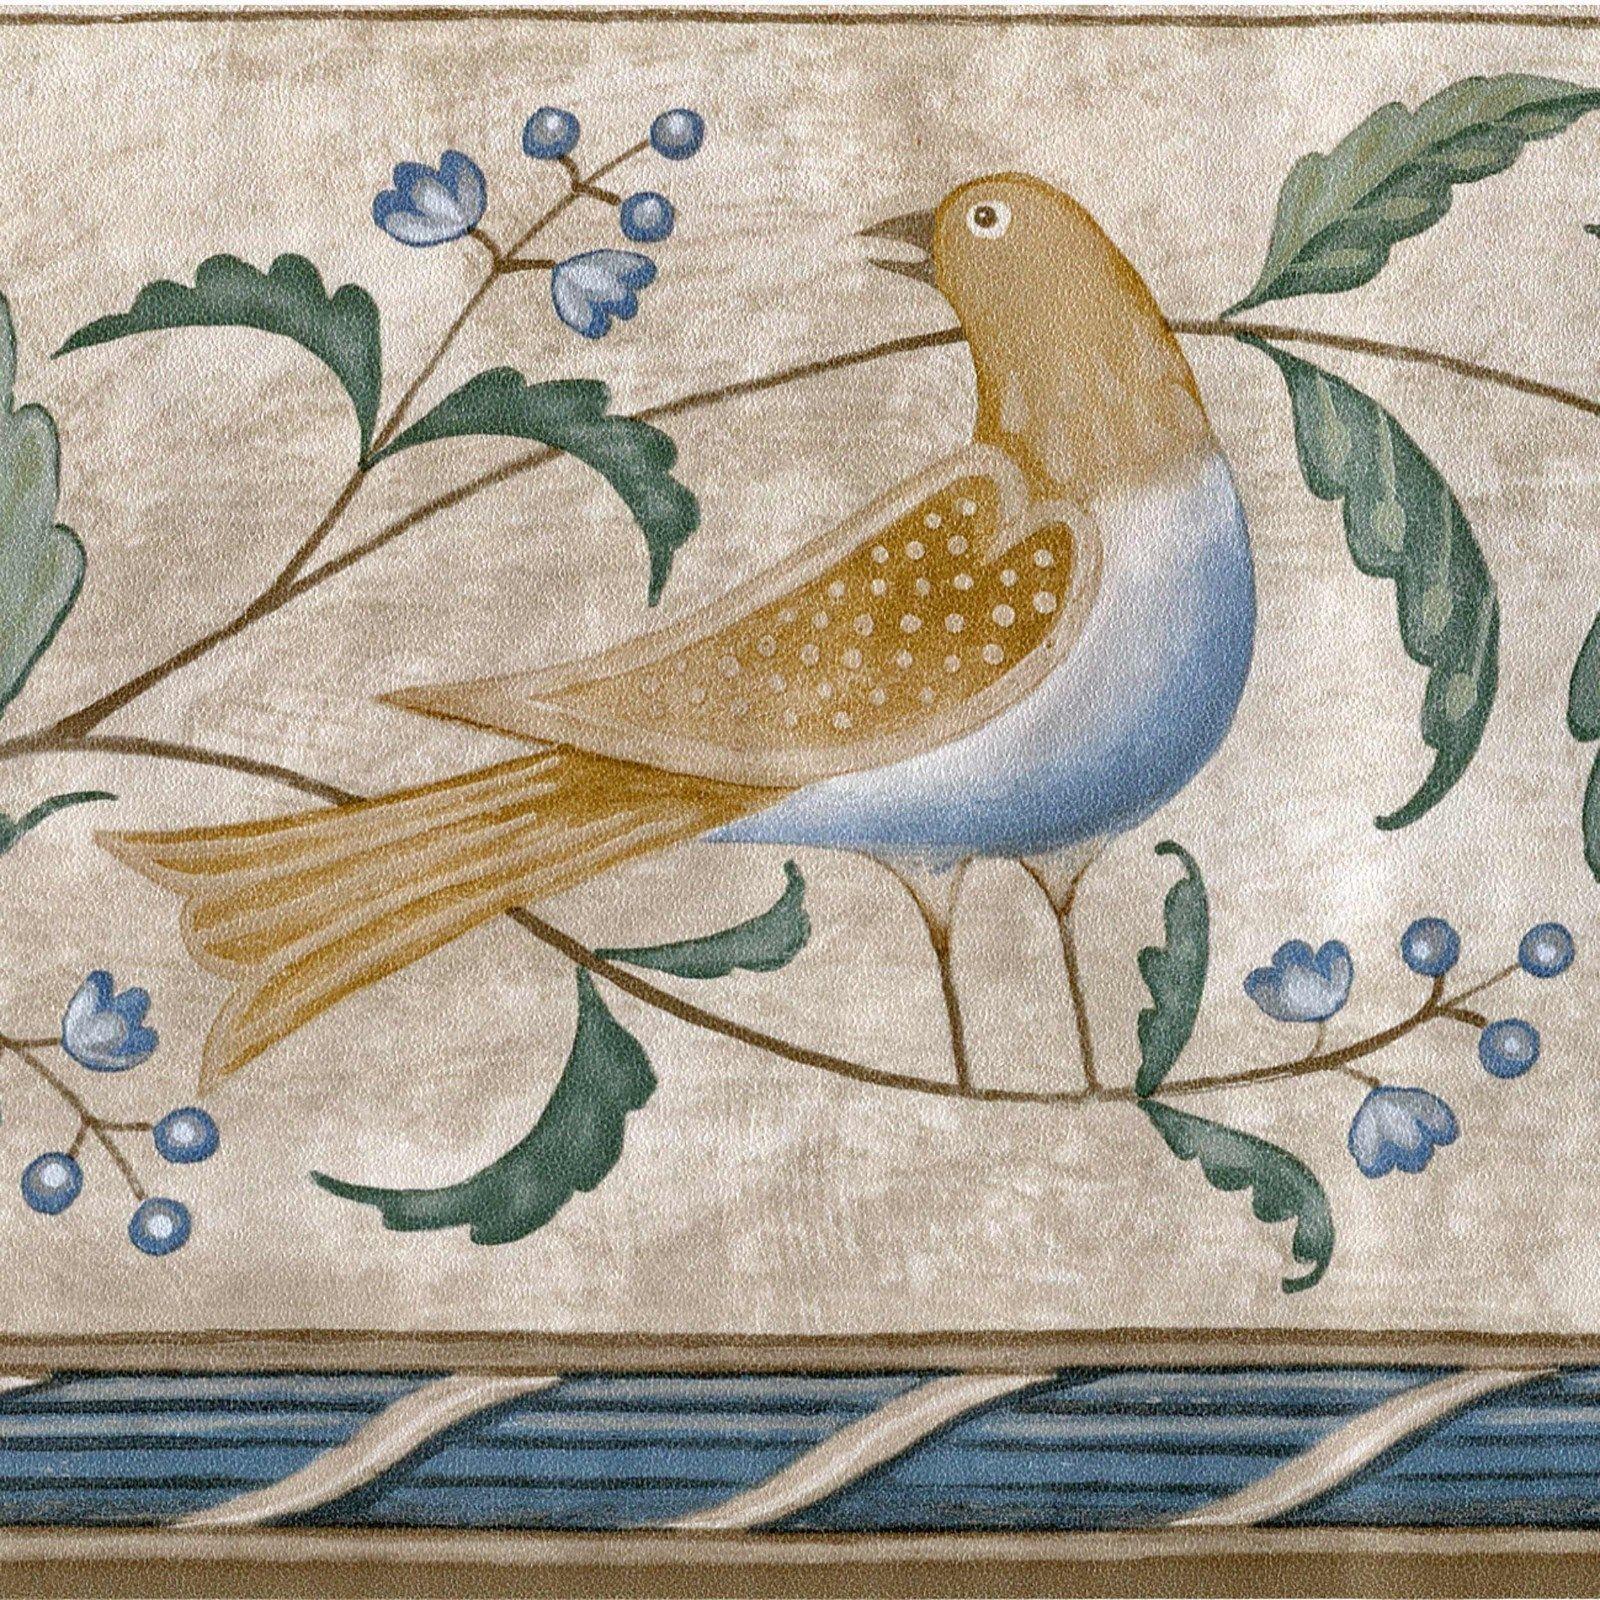 Small Birds, Flowers & Leaf Wallpaper Border Lot 60 feet